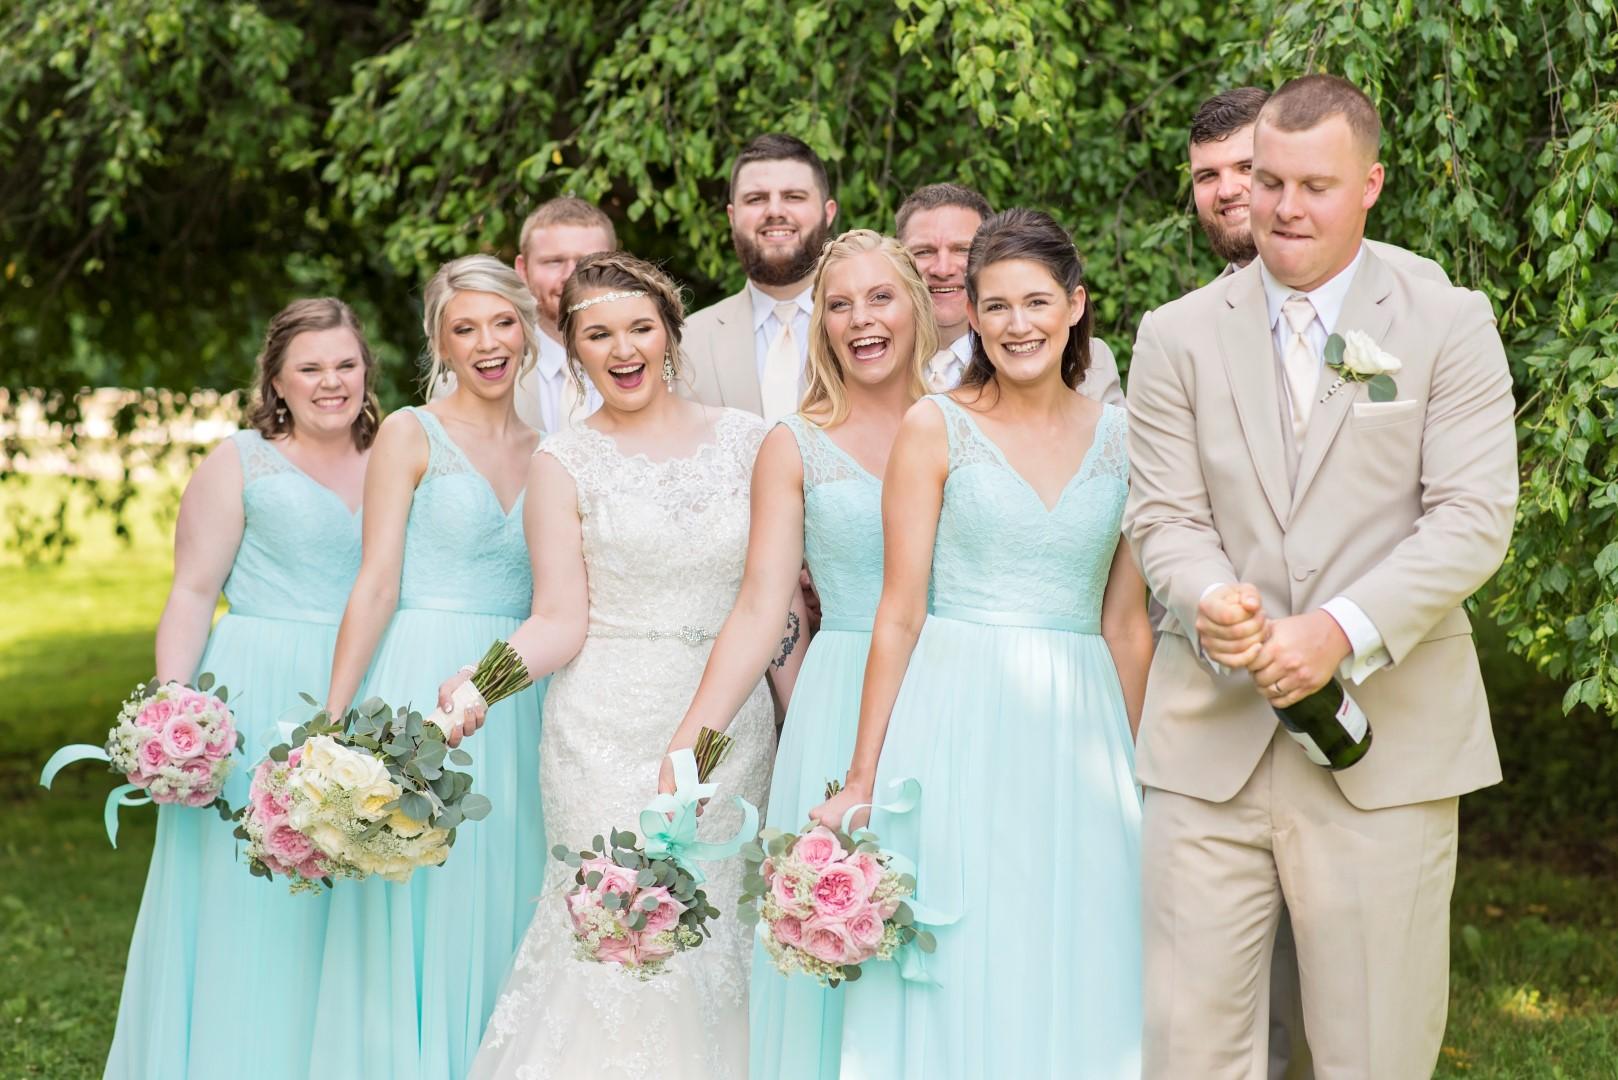 Madison+Austin_Wedding_SneakPeek_22 (Large).jpg